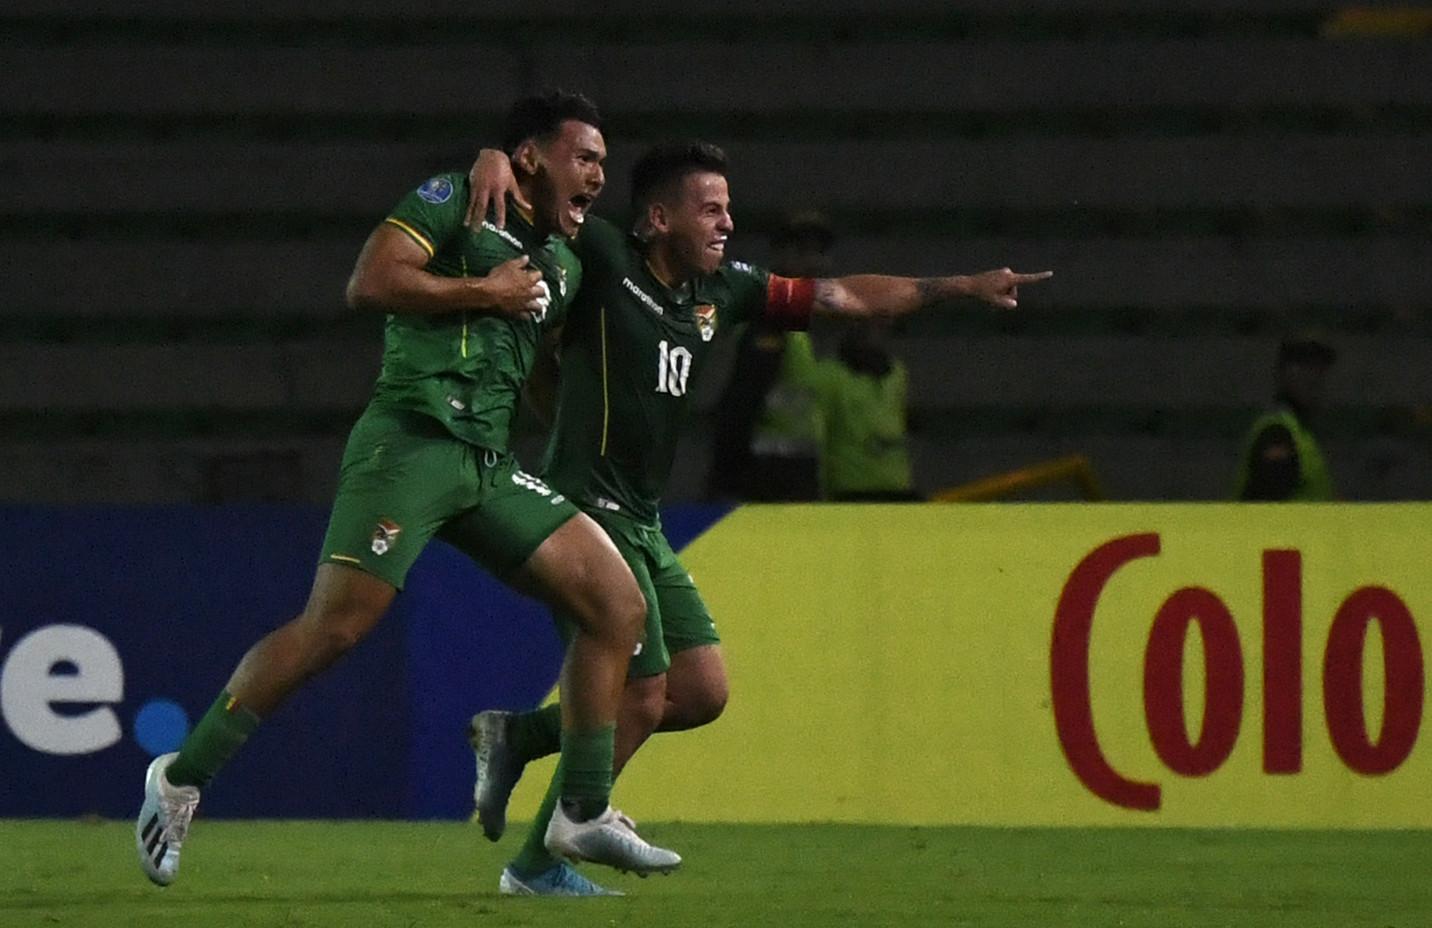 Bolivia striker Fernando Saldías celebrates scoring the last-gasp winner in in team's 3-2 win over Uruguay ©Getty Images